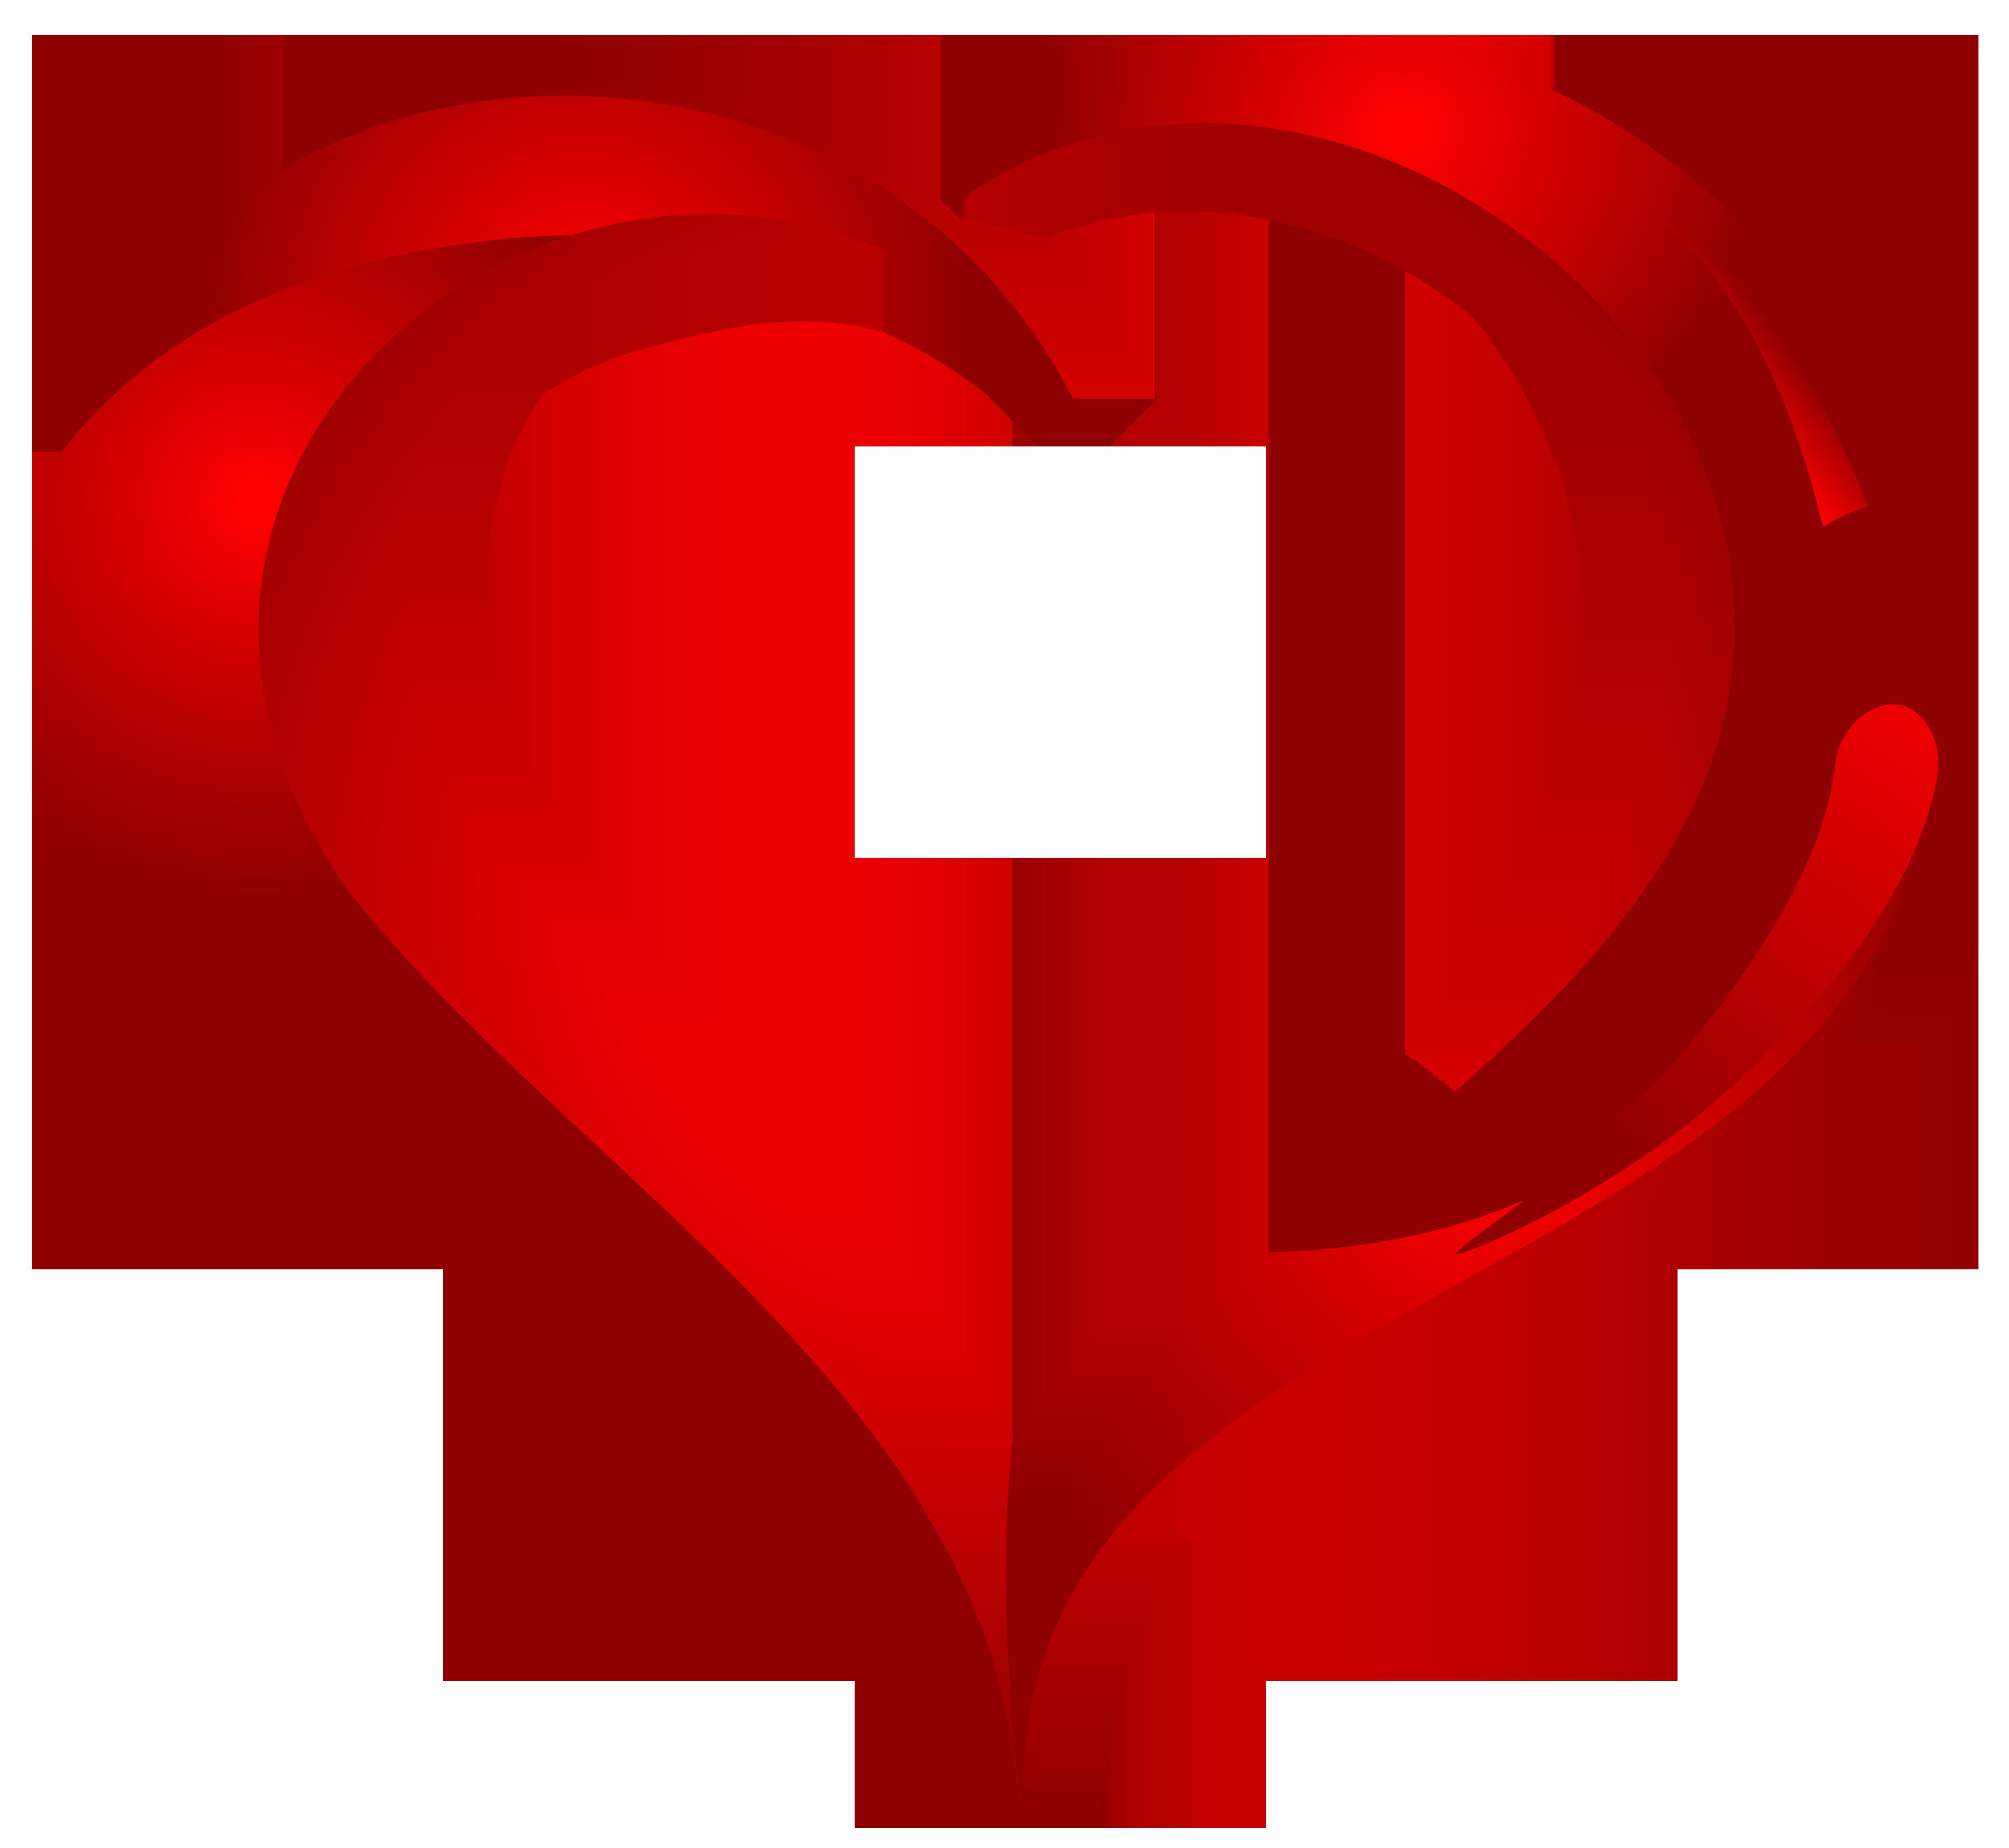 Beautiful clipart of heart - Heart HD PNG